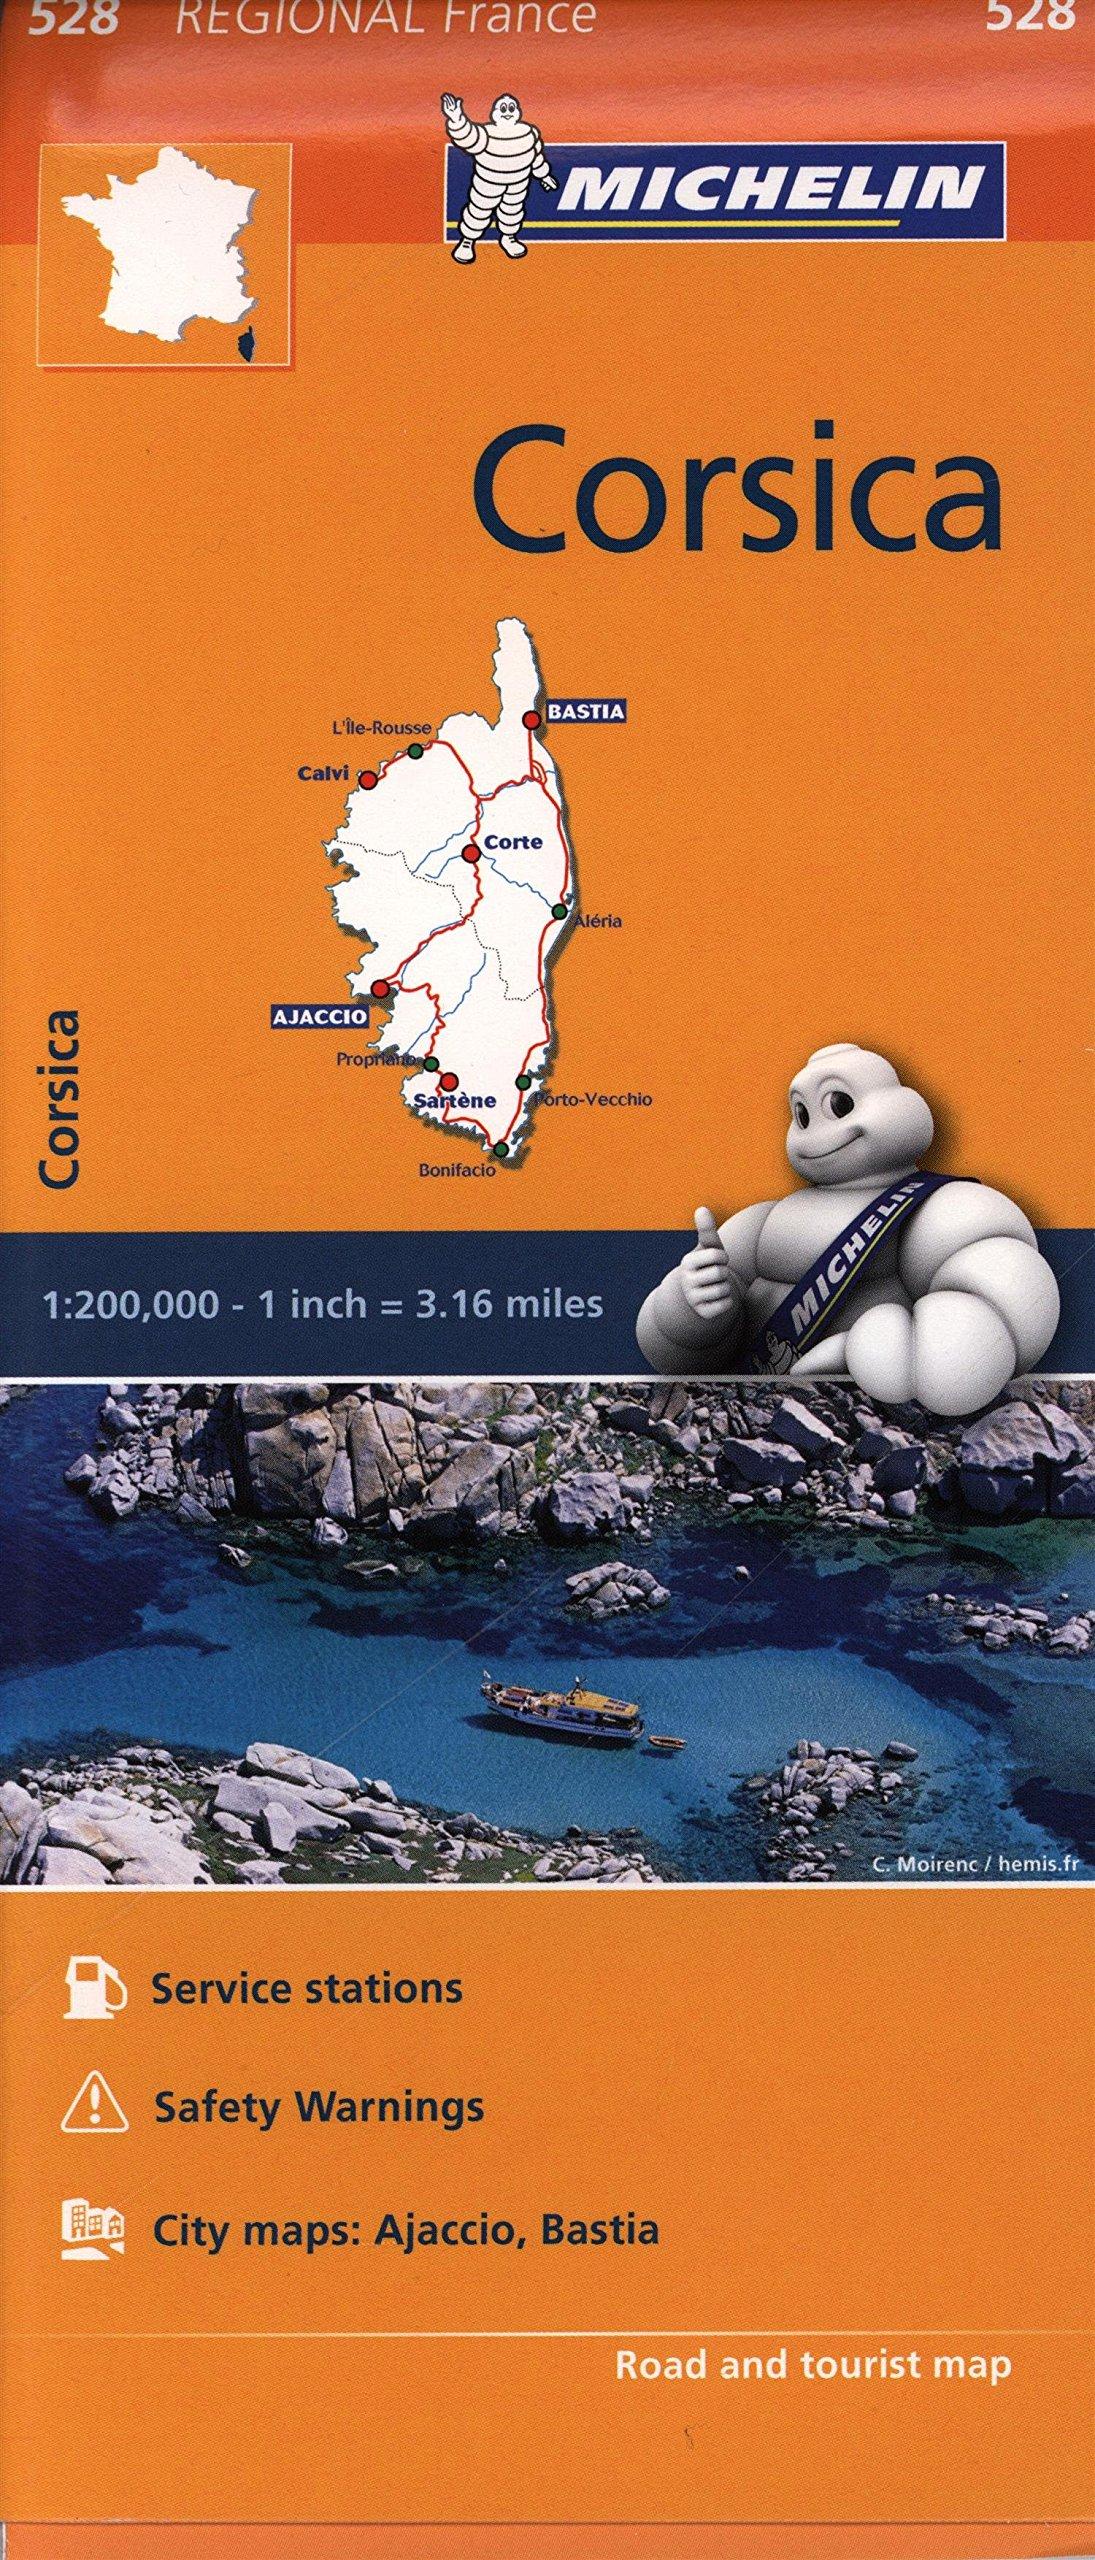 Mapa Regional Corsica (Carte regionali) (Inglés) Mapa – Mapa doblado, 5 ago 2016 Vv.Aa 2067211862 France Europe - France